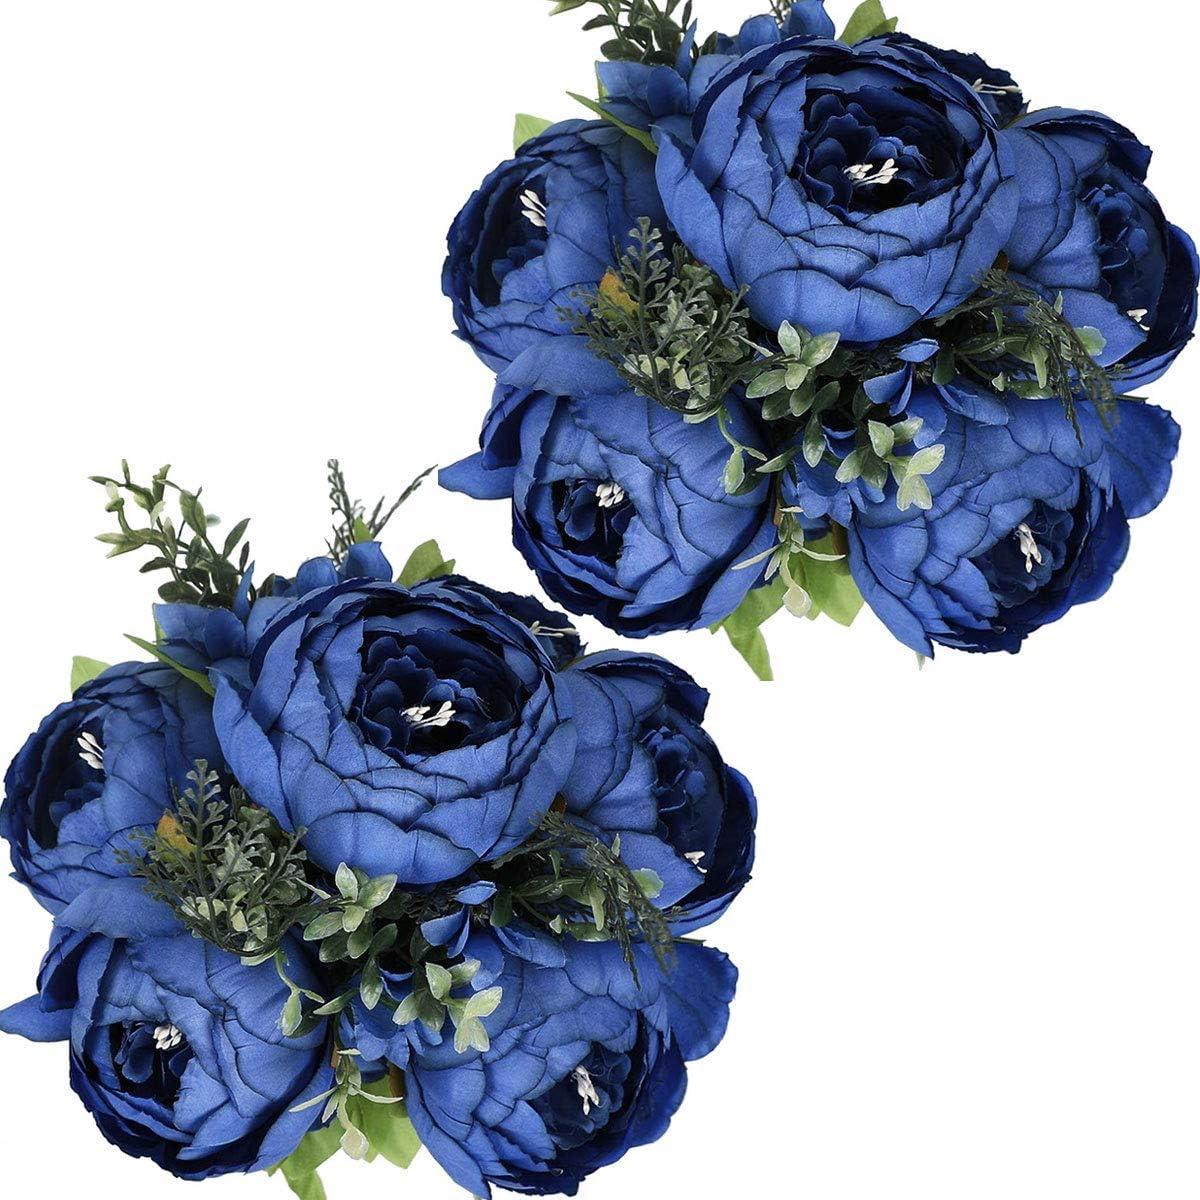 Nubry 2pcs Artificial Peony Silk Flowers Bouquet for Wedding Home Garden Party Decoration (Blue)